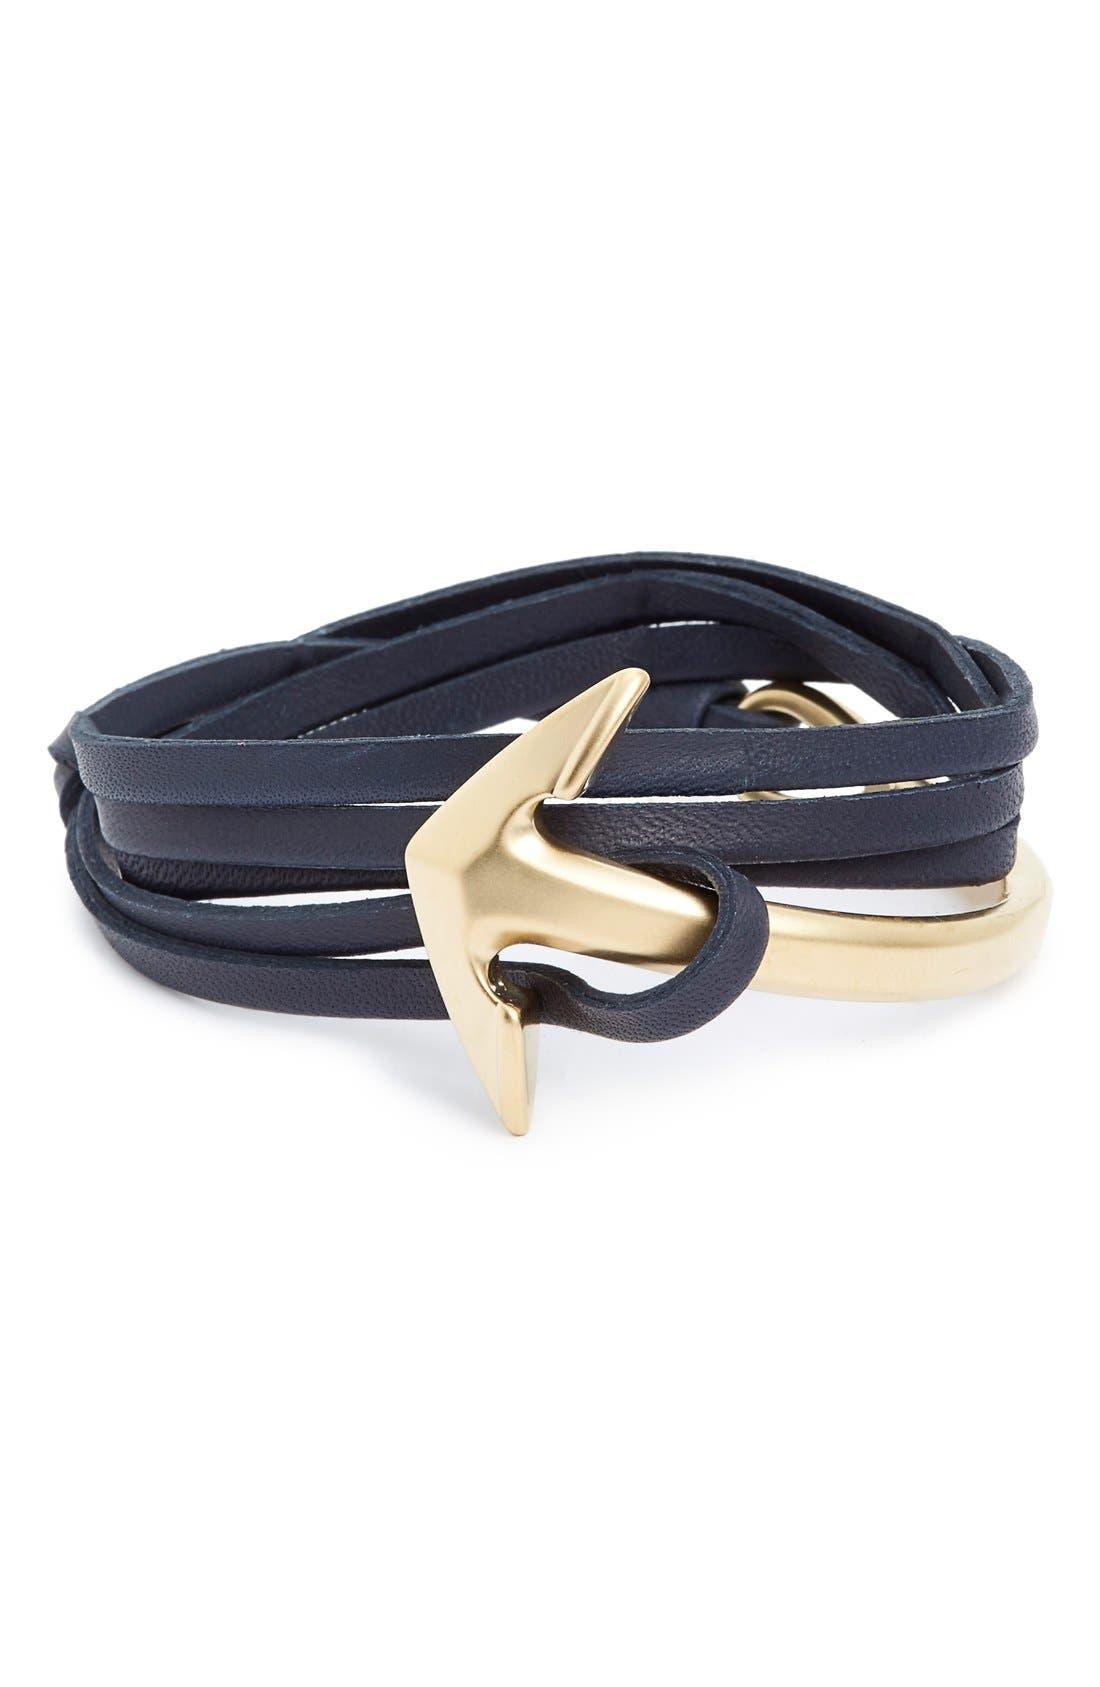 Main Image - Miansai Half Cuff Anchor Leather Wrap Bracelet